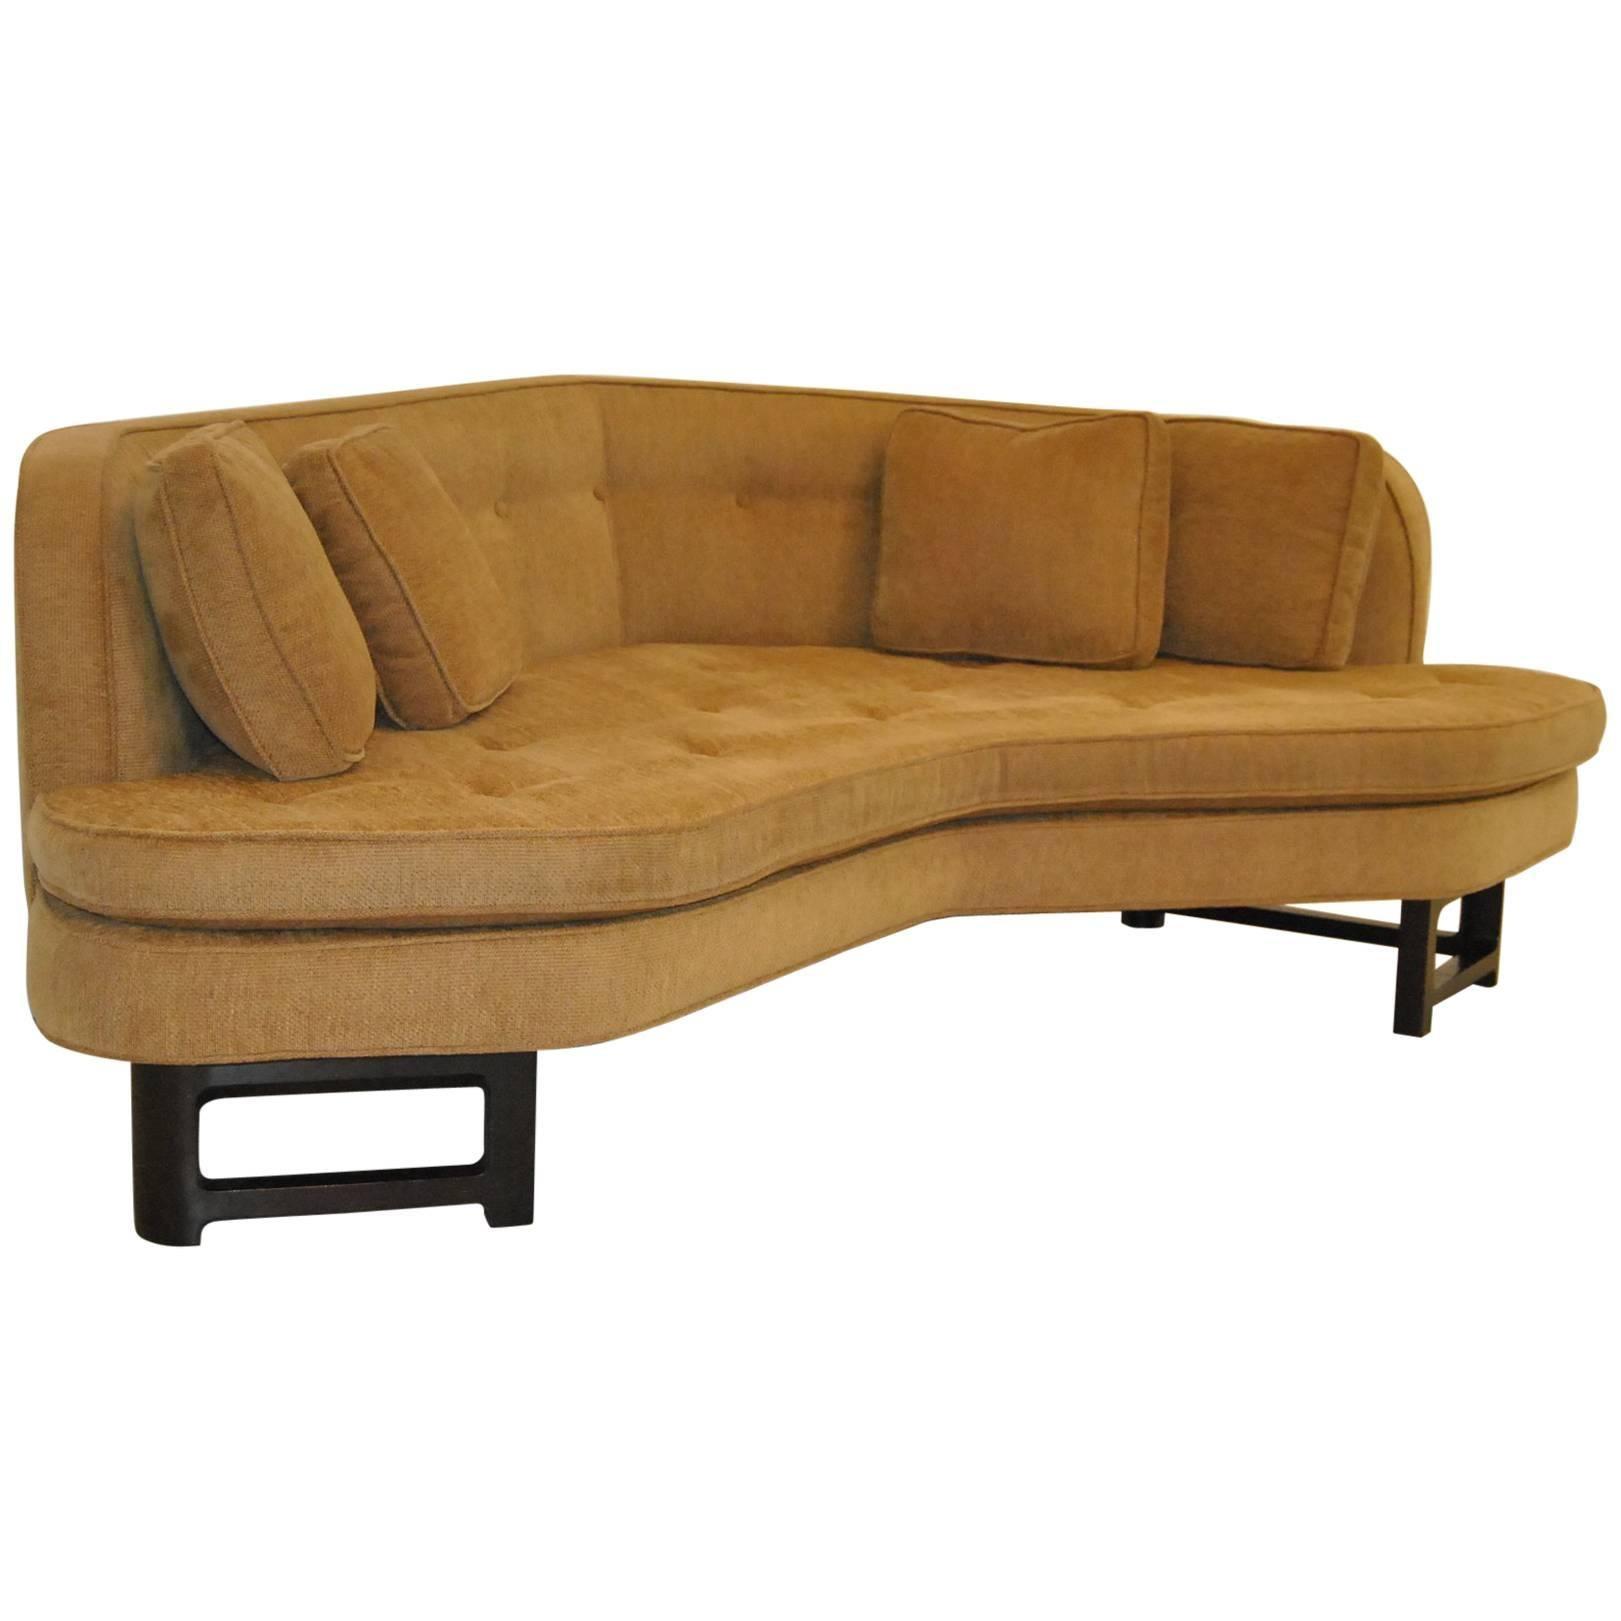 MidCentury Modern Sofa by Edward Wormley for Dunbar Furniture Janus